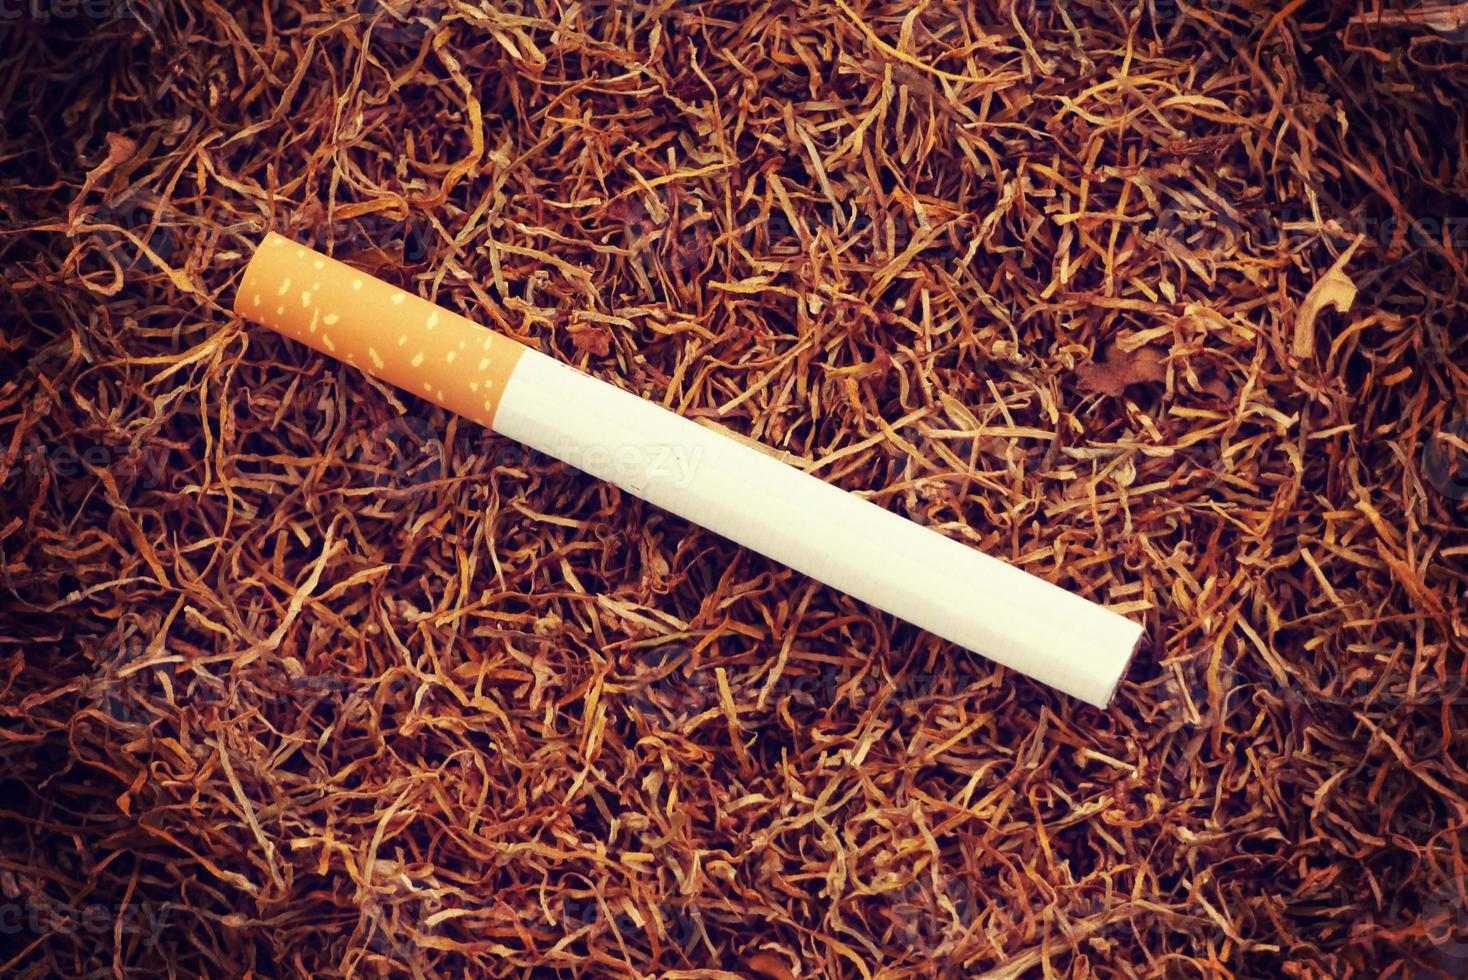 sigaretta vecchio stile vintage retrò foto